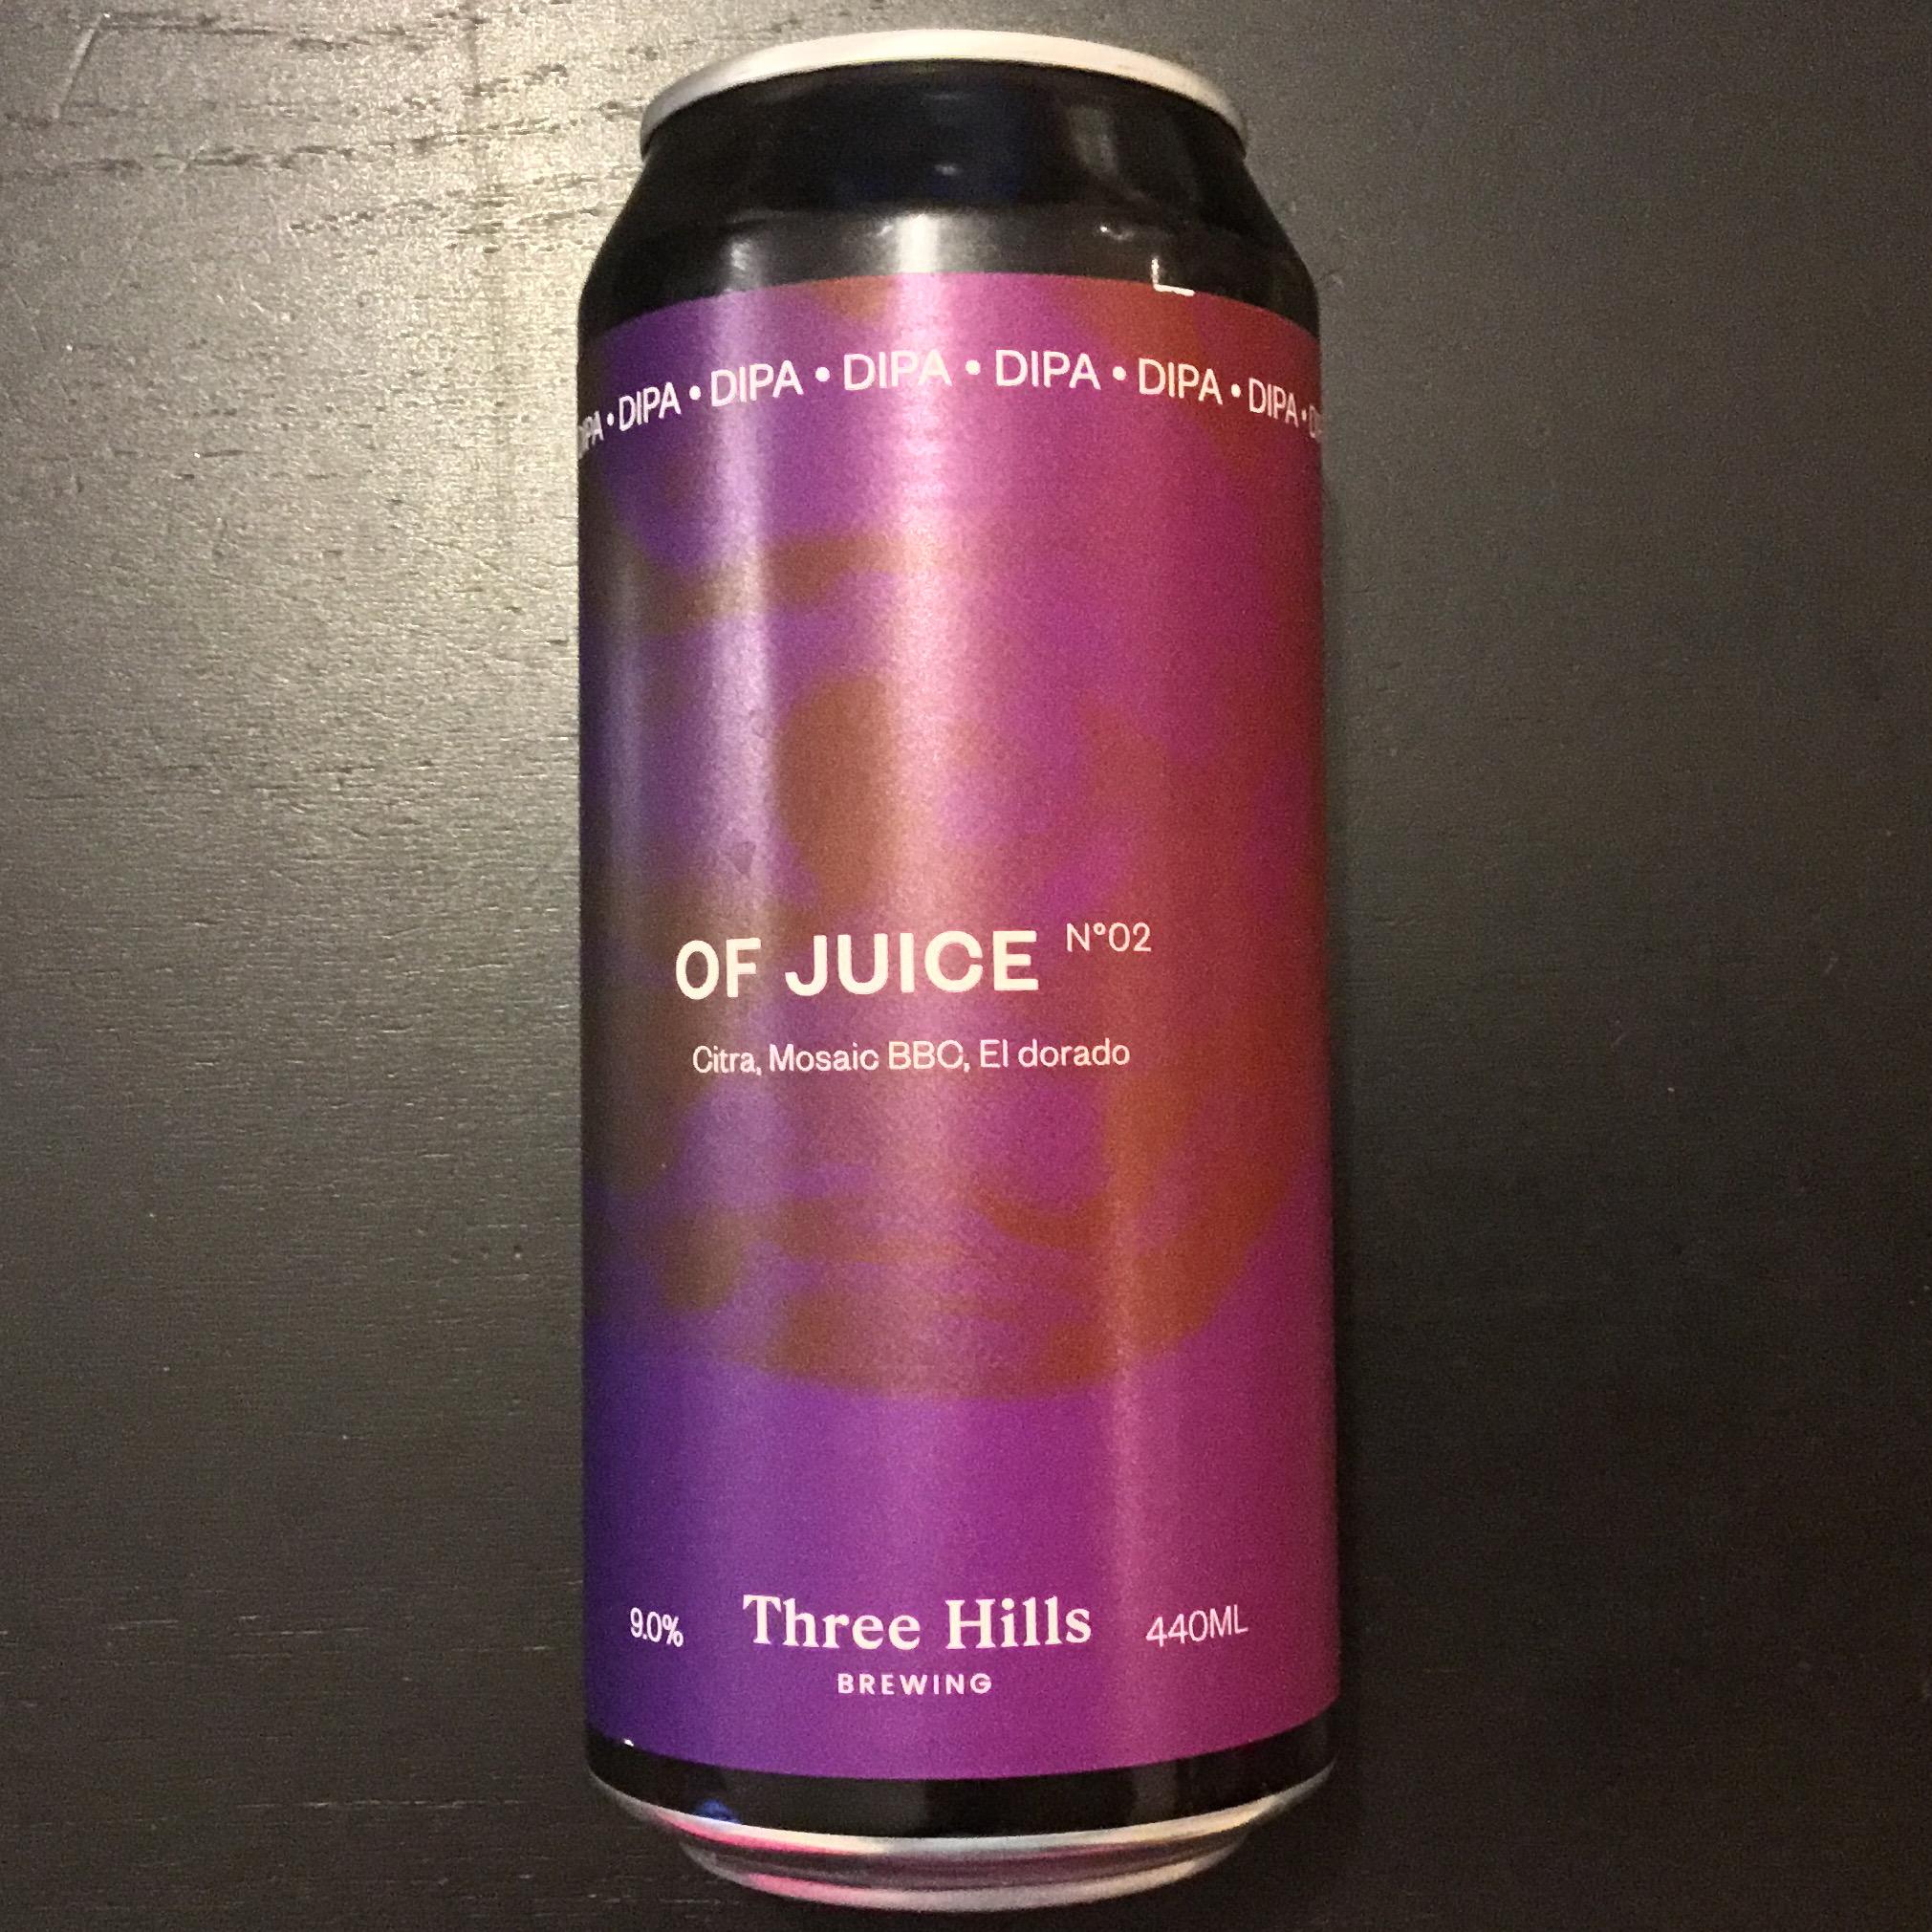 Of Juice DIPA 9% 440ml No2 Three Hills Brewing